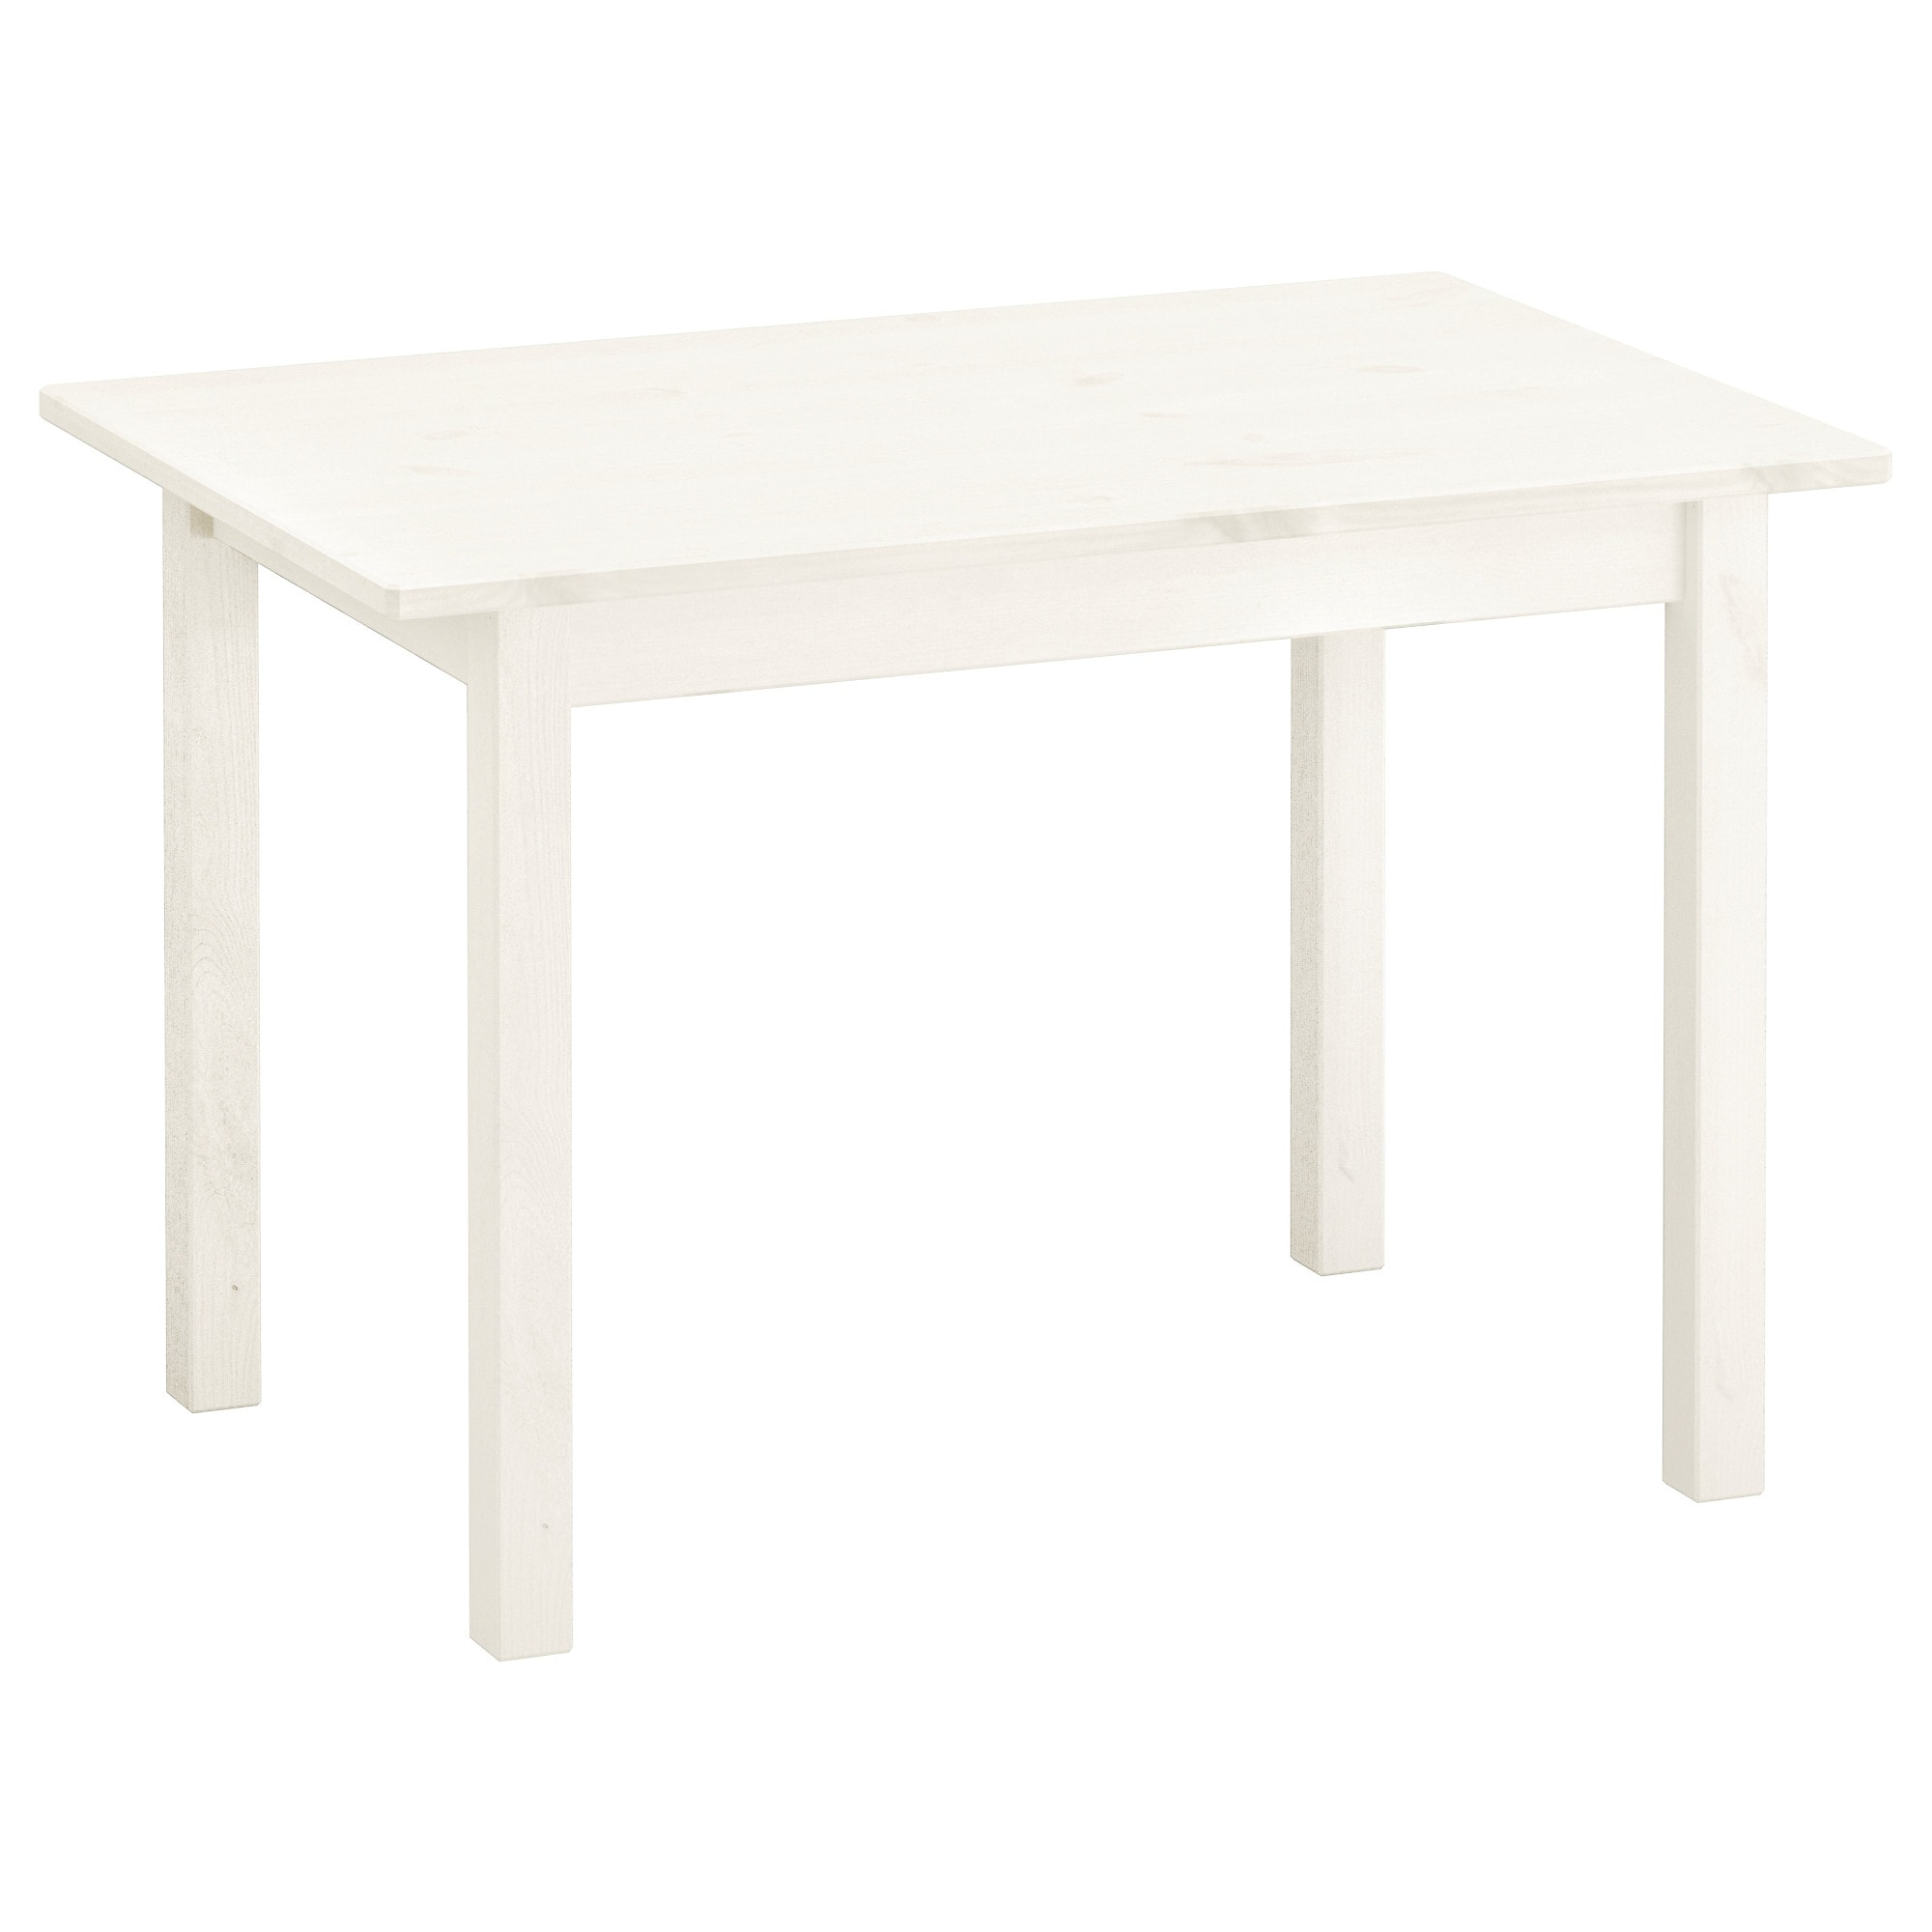 Ikea Sillas Niños 0gdr Sundvik Mesa Para Nià Os Blanco 76 X 50 Cm Ikea